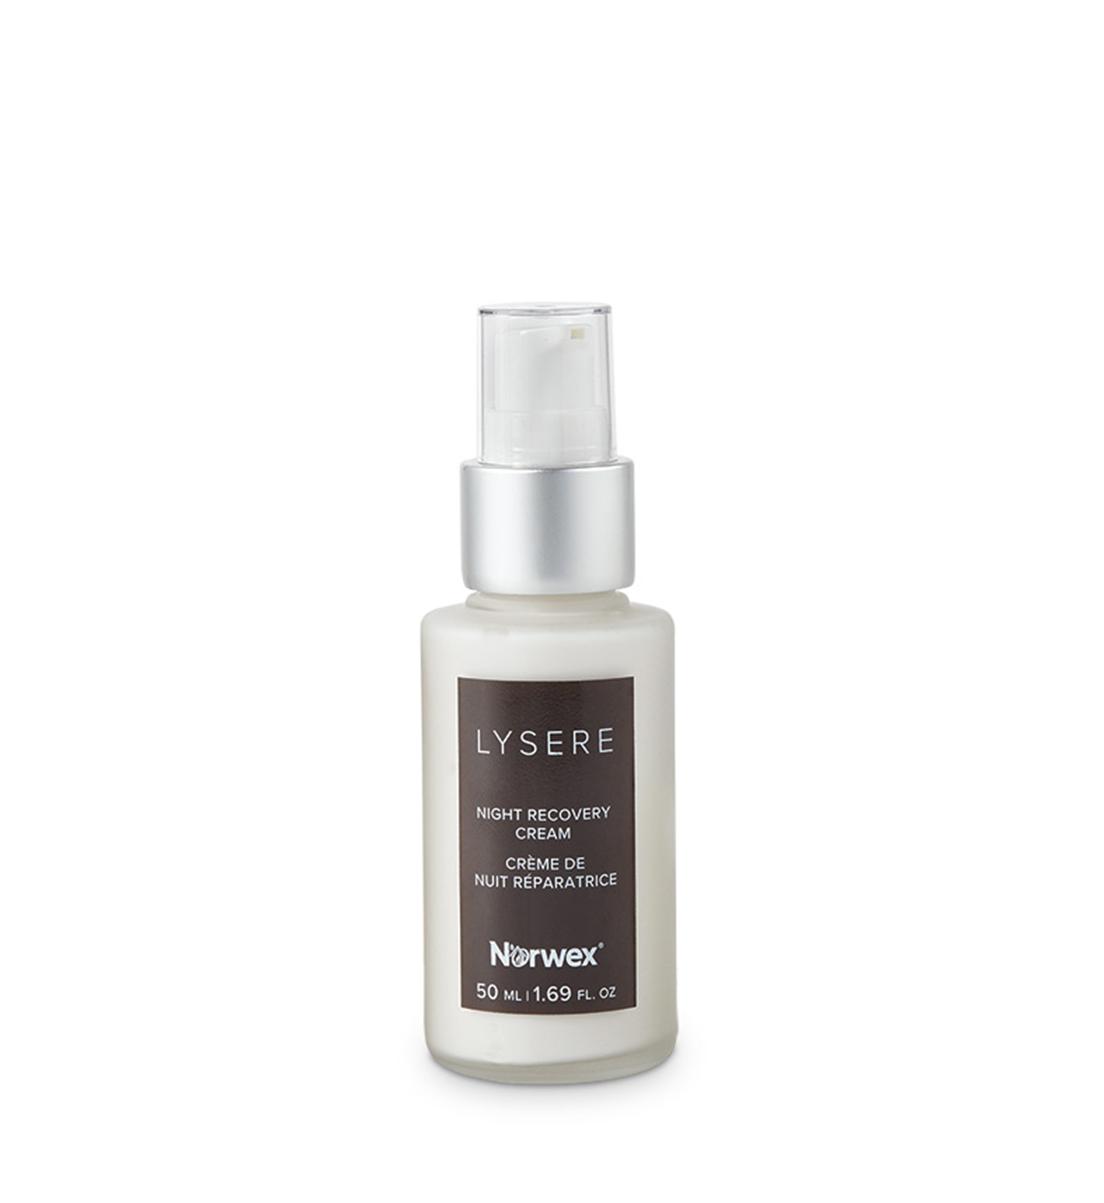 Lysere Night Recovery Cream